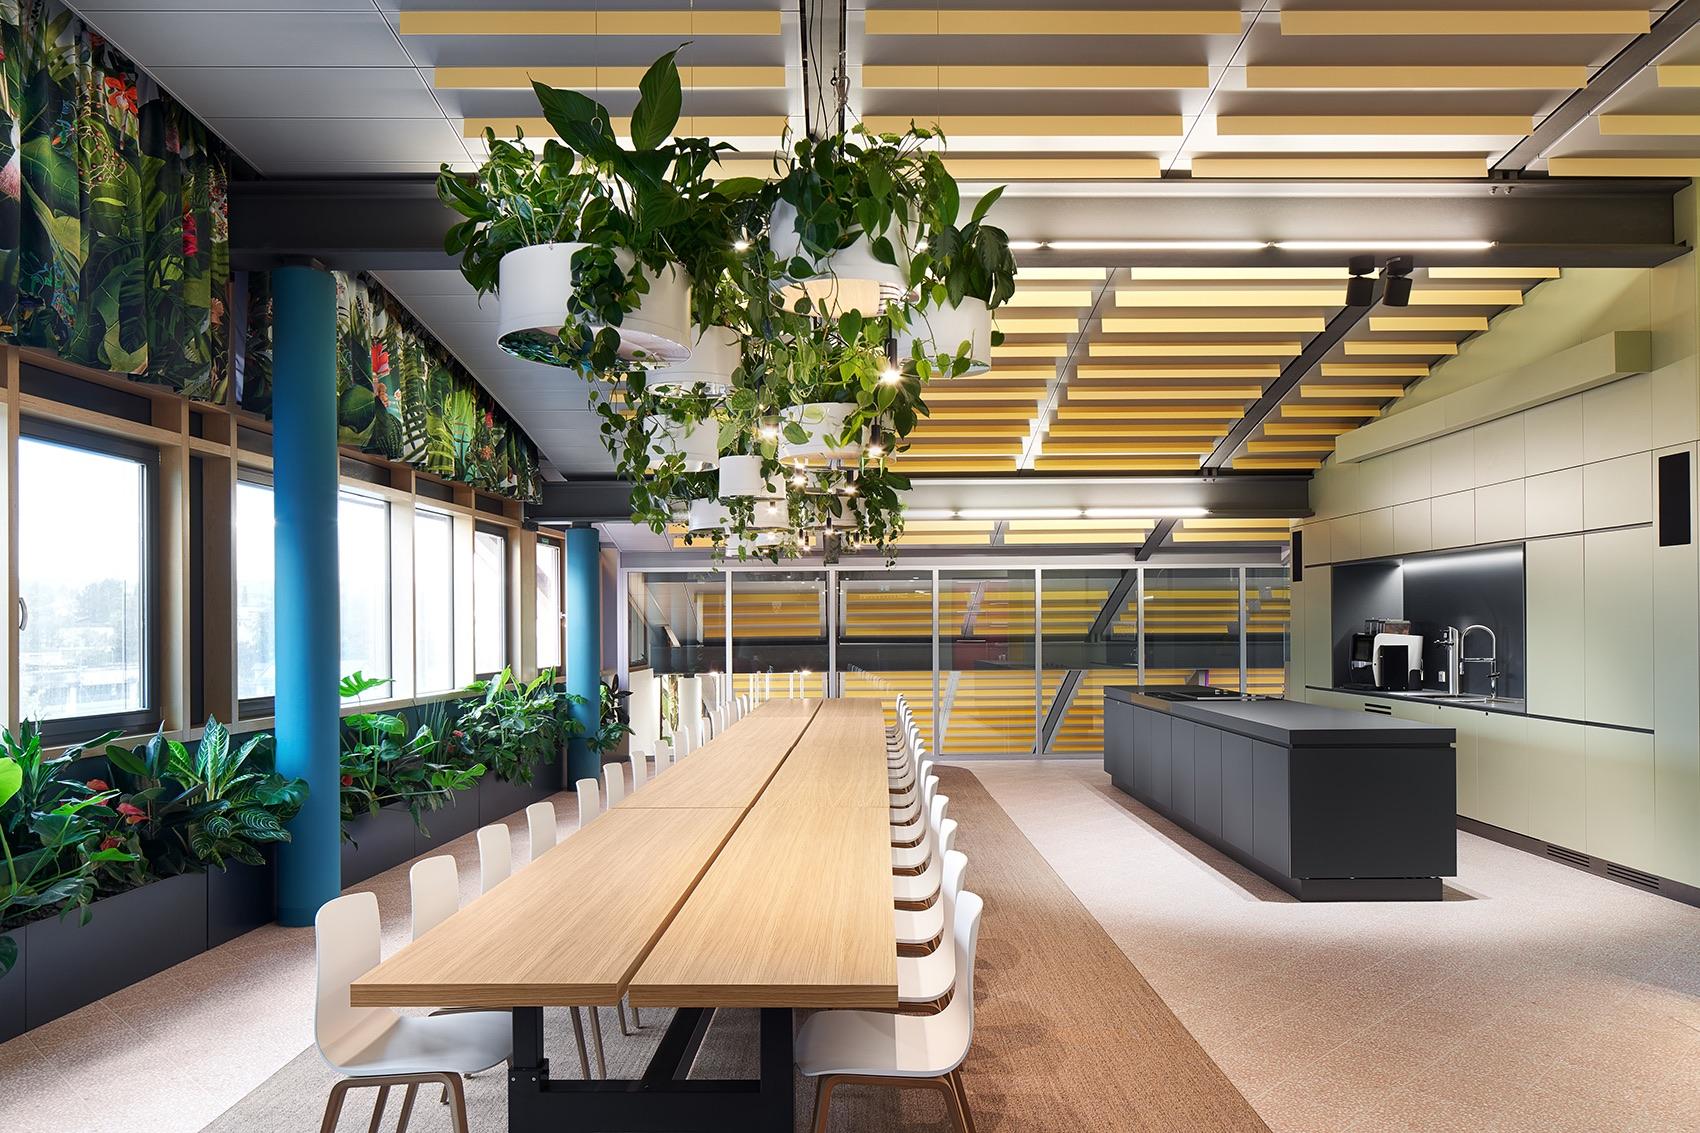 roman-klis-design-office-8